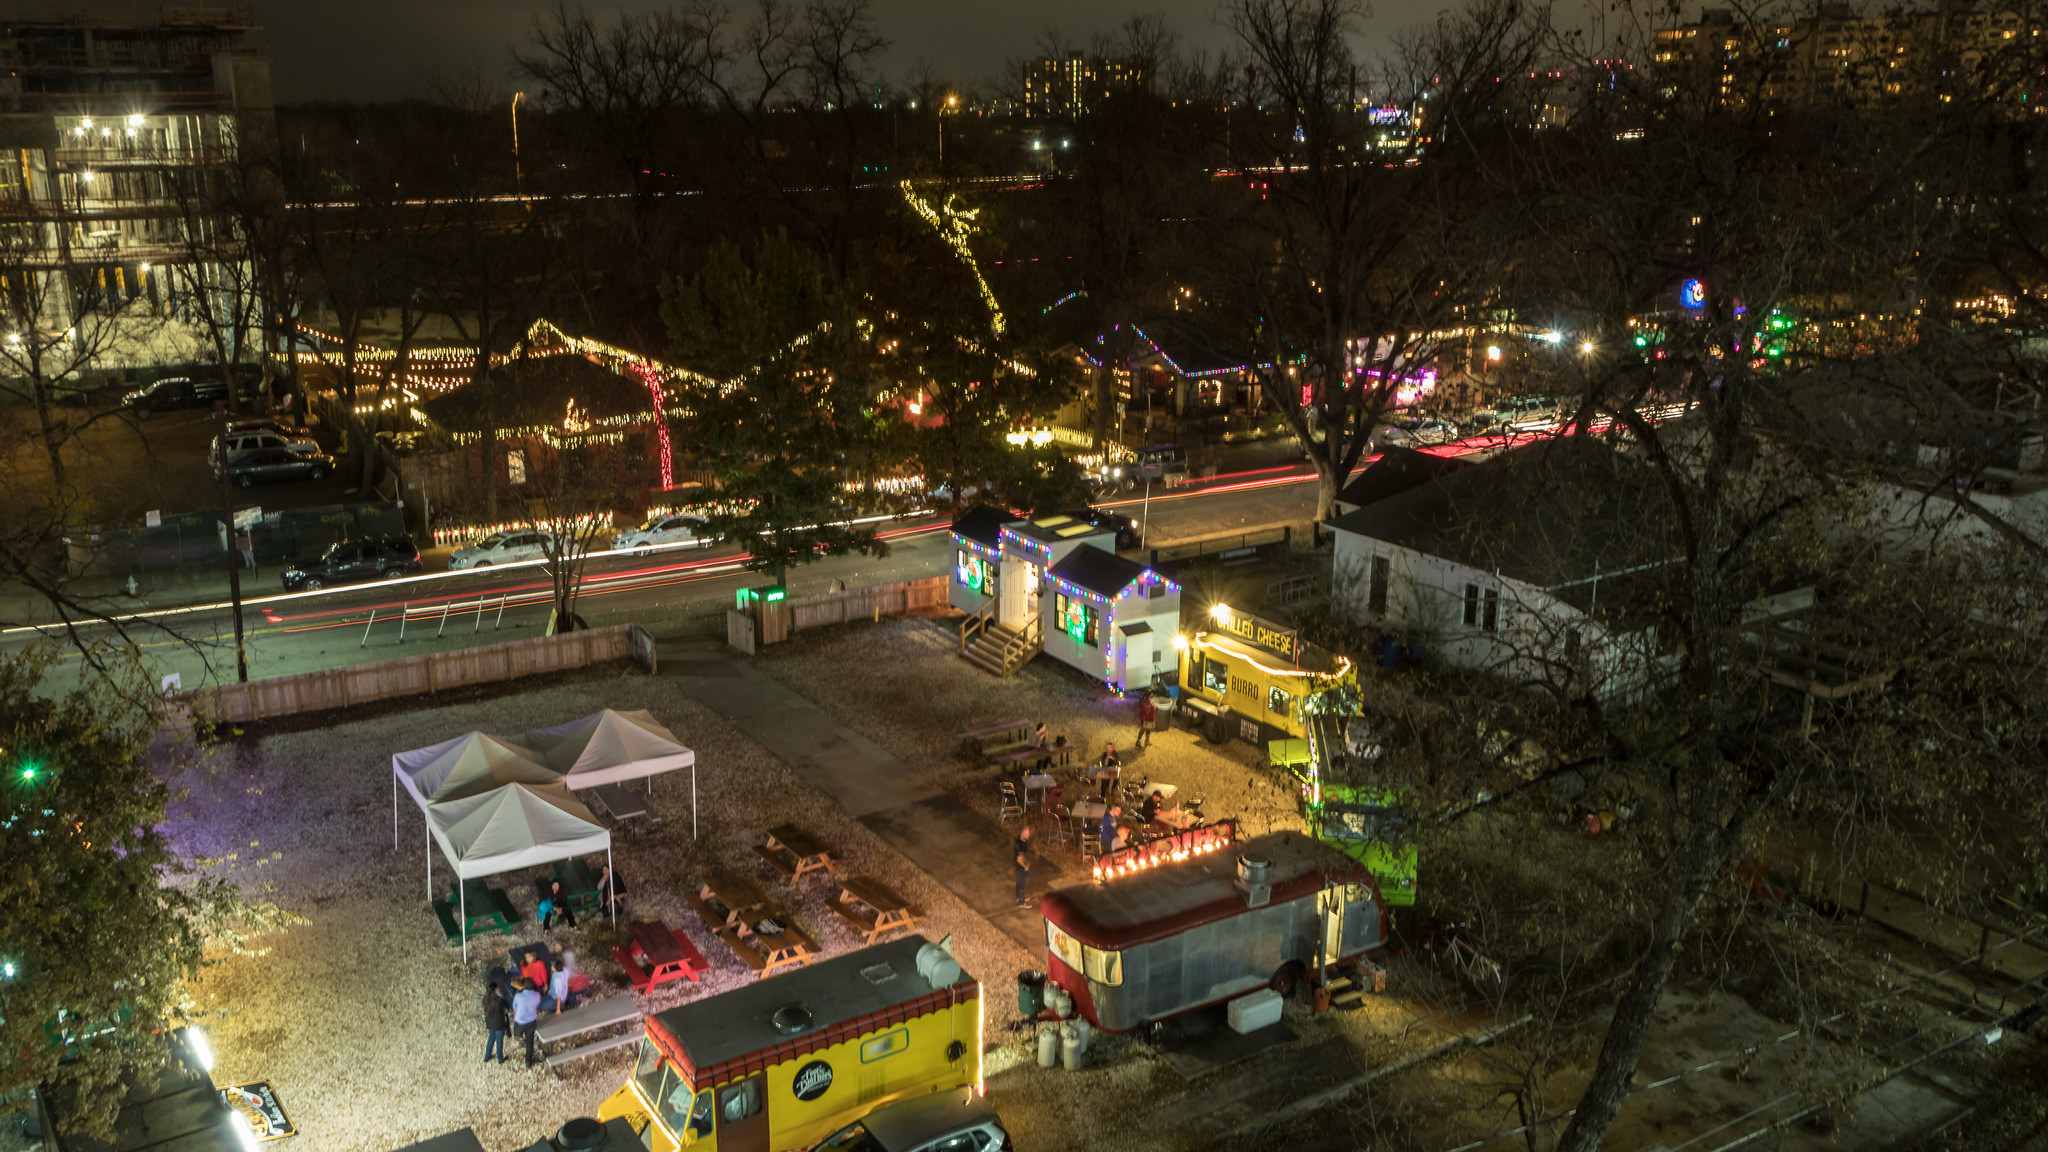 Overhead night shot of street, food trucks